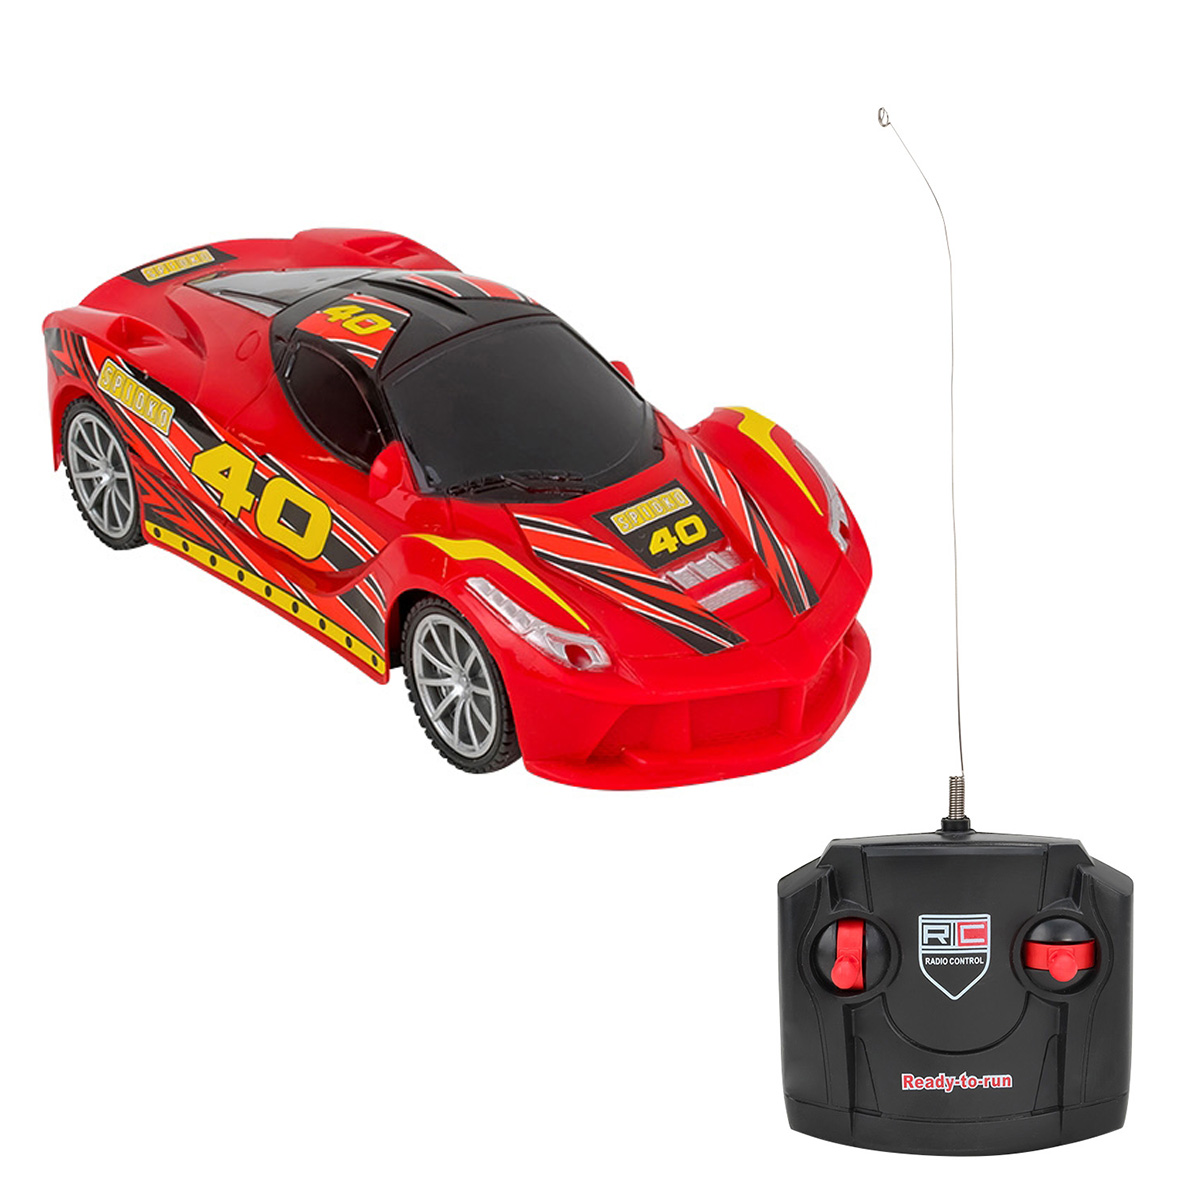 Masinuta cu telecomanda Globo Racing Car, Rosu